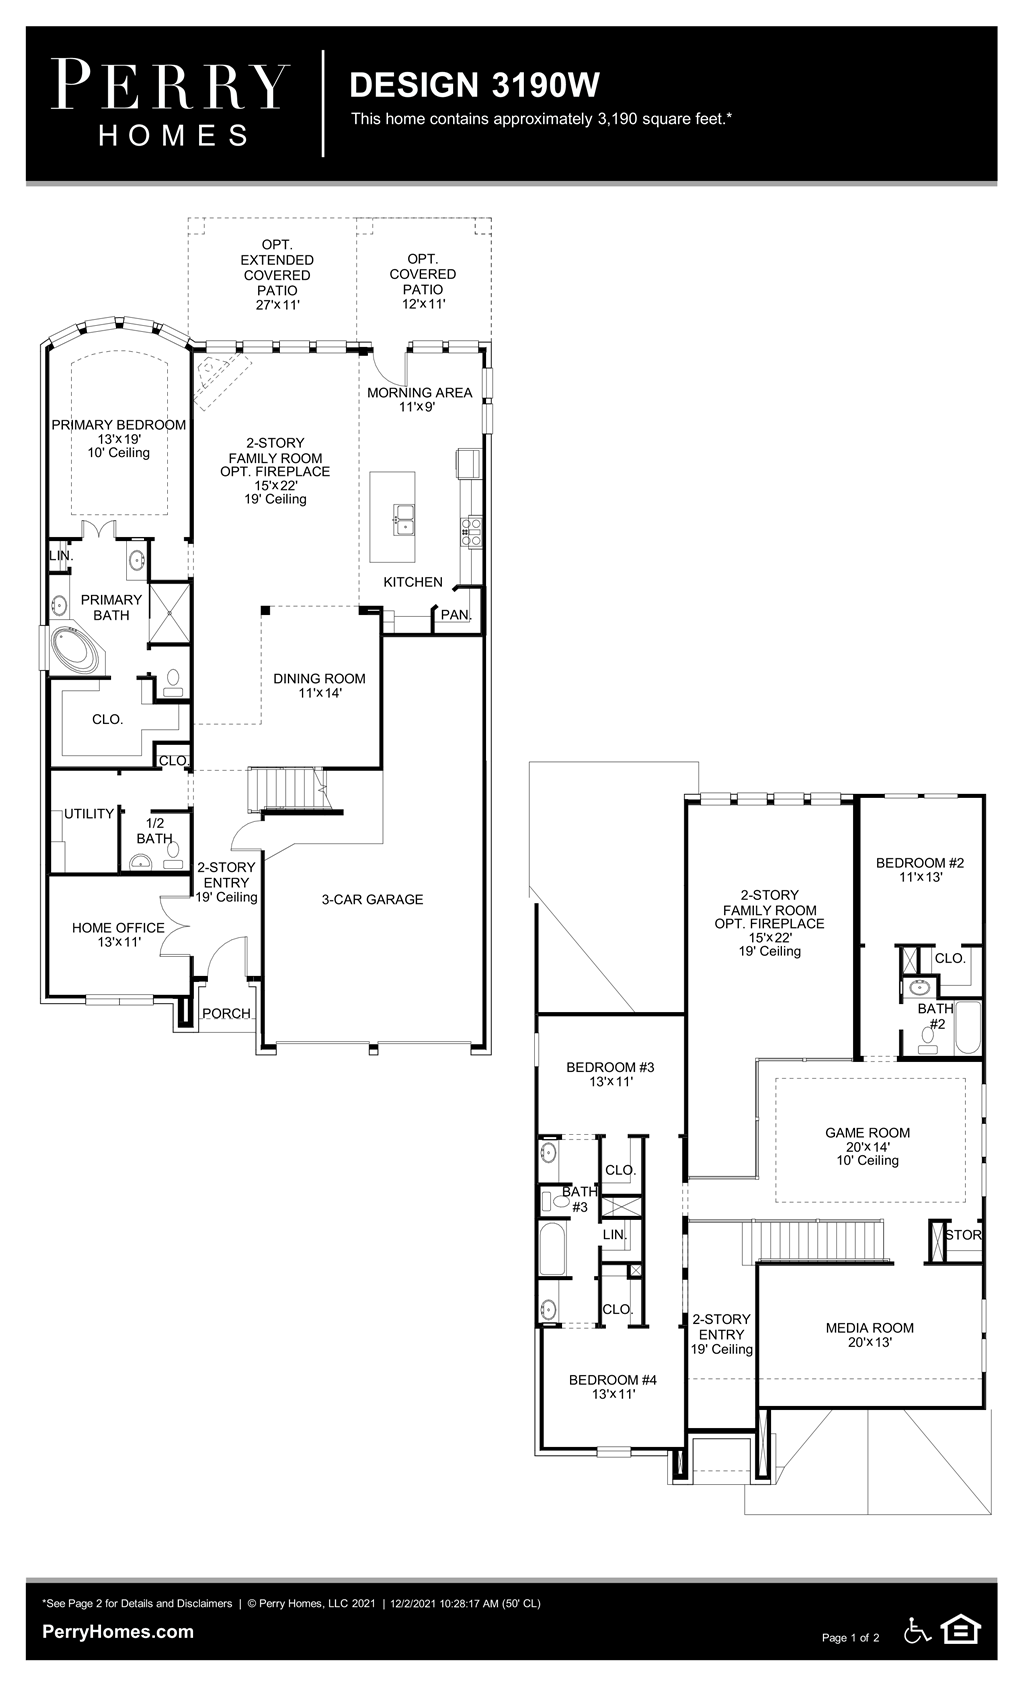 Floor Plan for 3190W